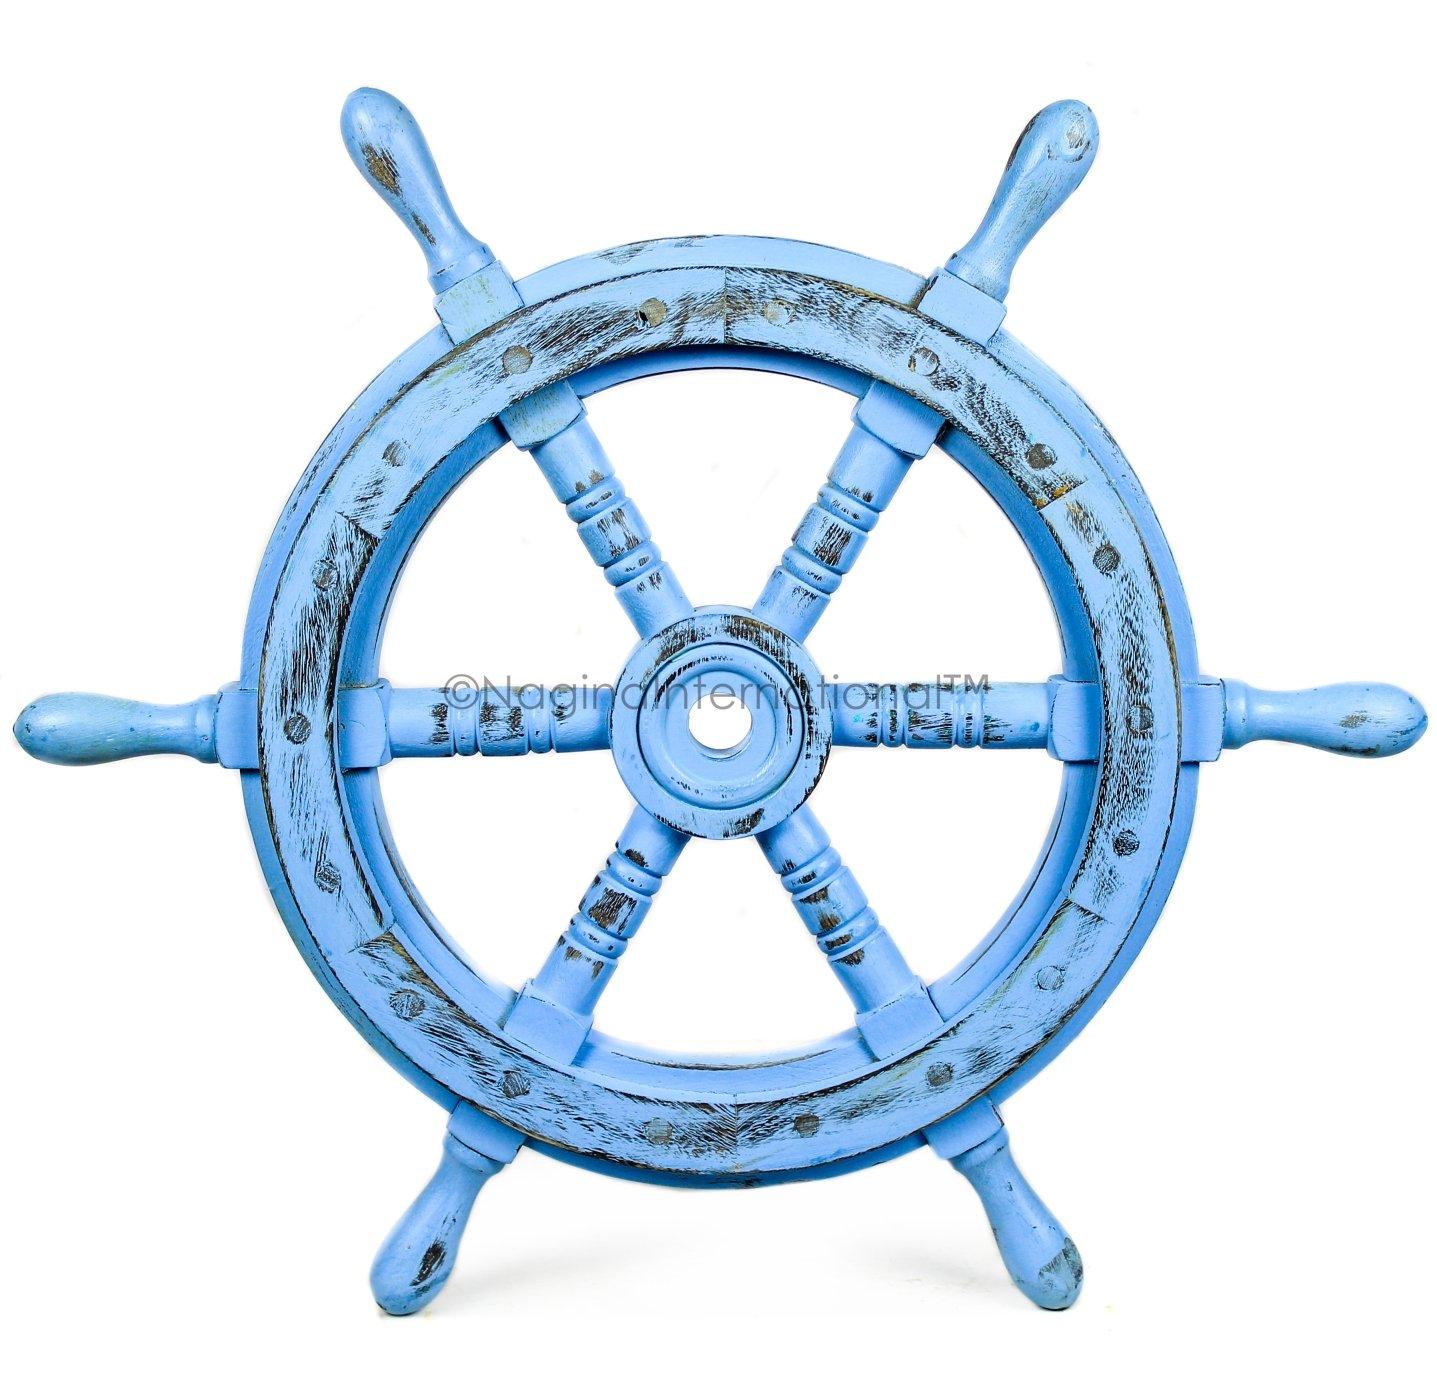 Nagina International(ナジャイナインターナショナル) Nautical高級ハンドクラフト木製操舵輪 | 海賊風家庭壁装飾&ギフト |16 Inches ブルー nw-ant-av16 B075W5QN92 16 Inches|Antique Sky Blue Antique Sky Blue 16 Inches